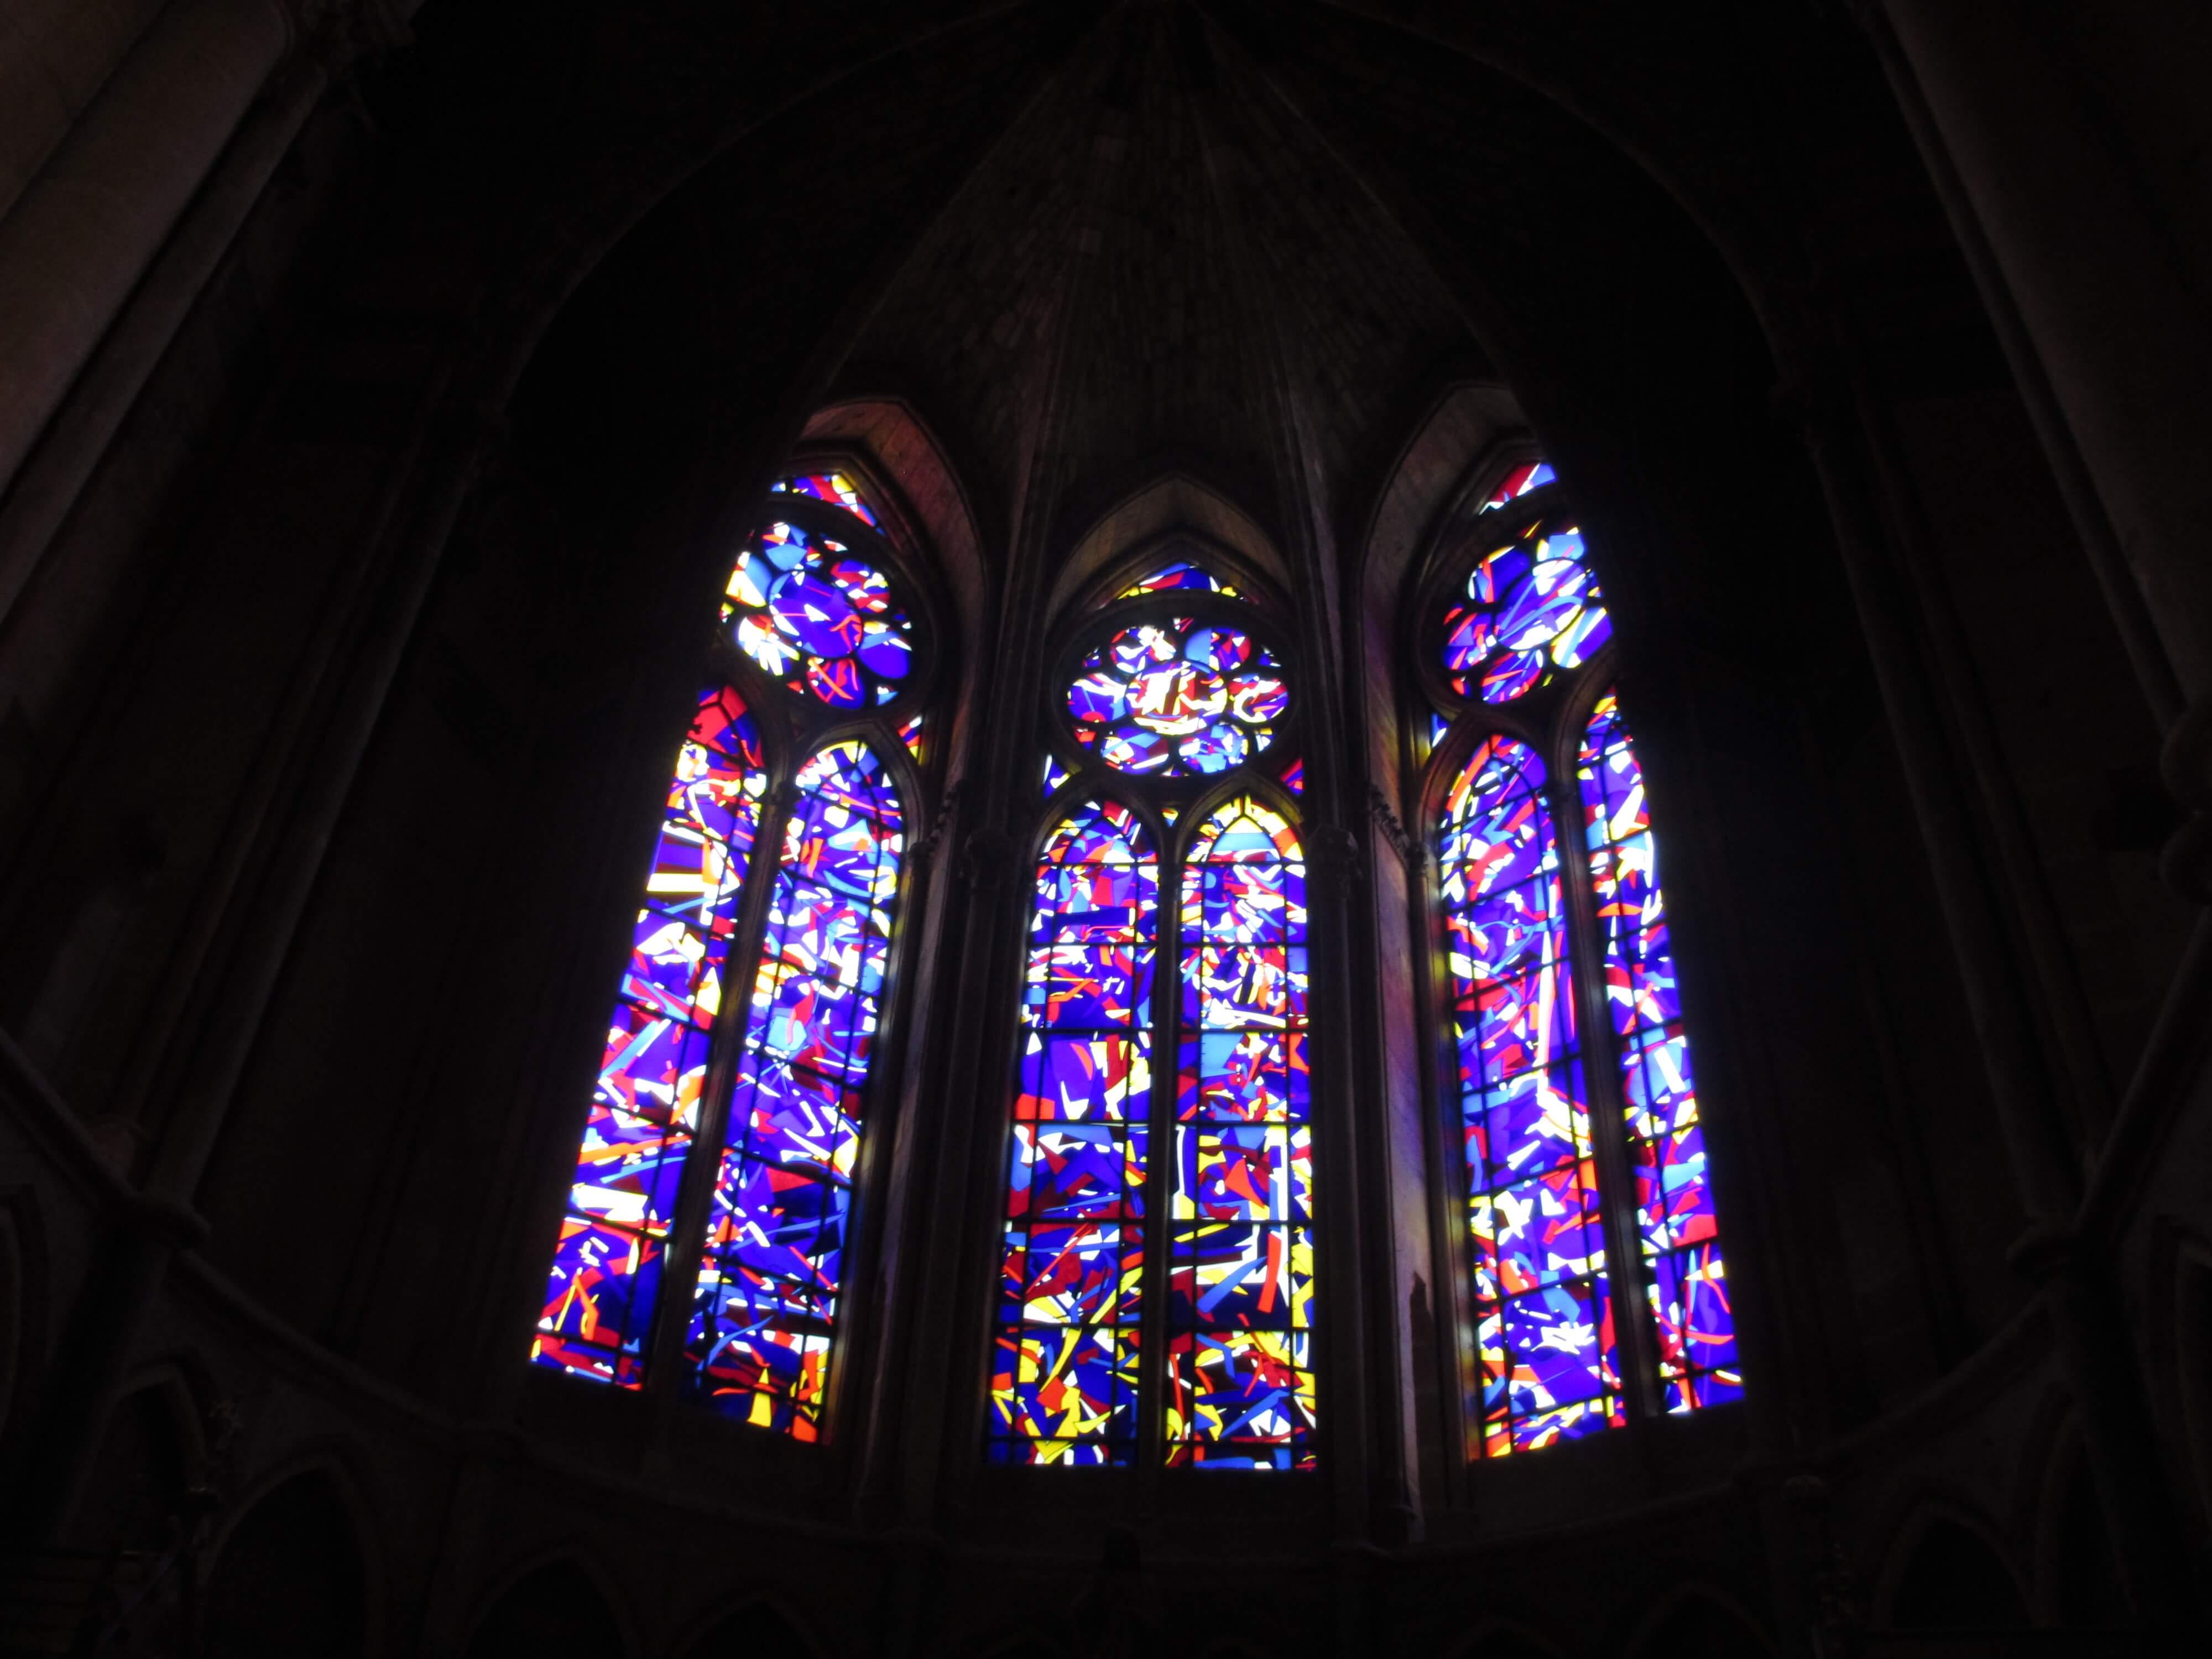 The modern windows designed by German Imi Knoebel